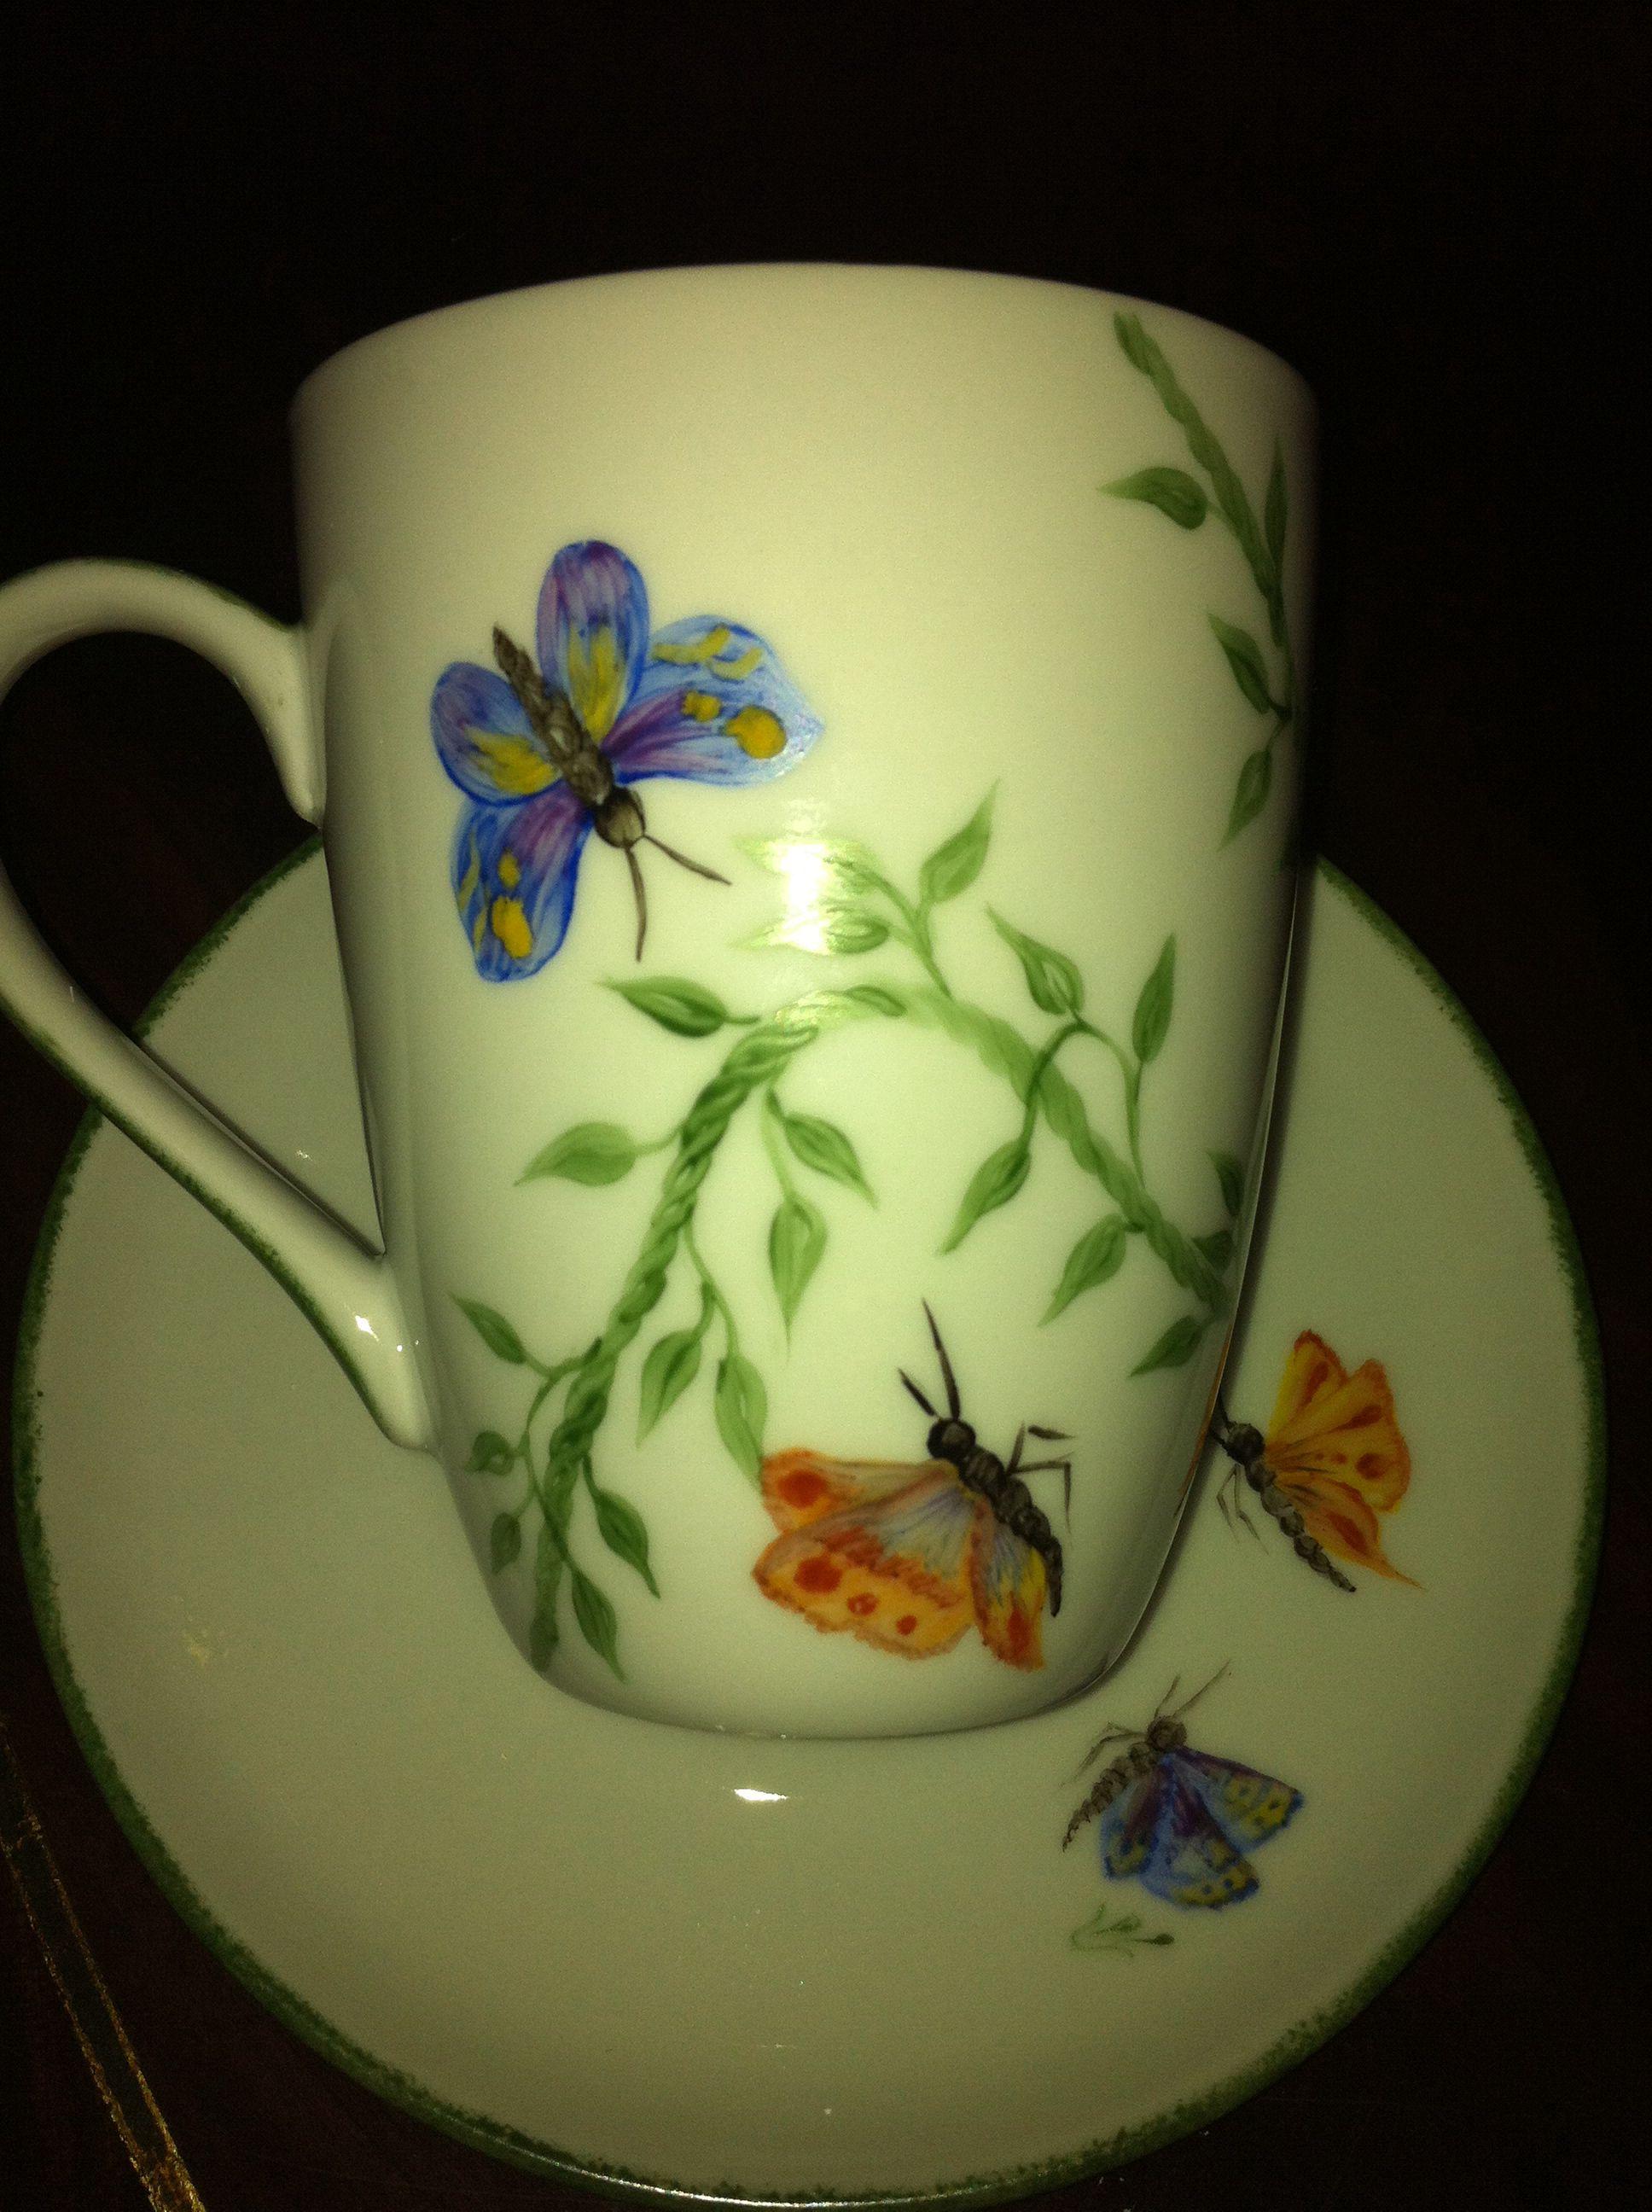 Butterflys mug 도자기 힘인휅 도자기 힘인휅